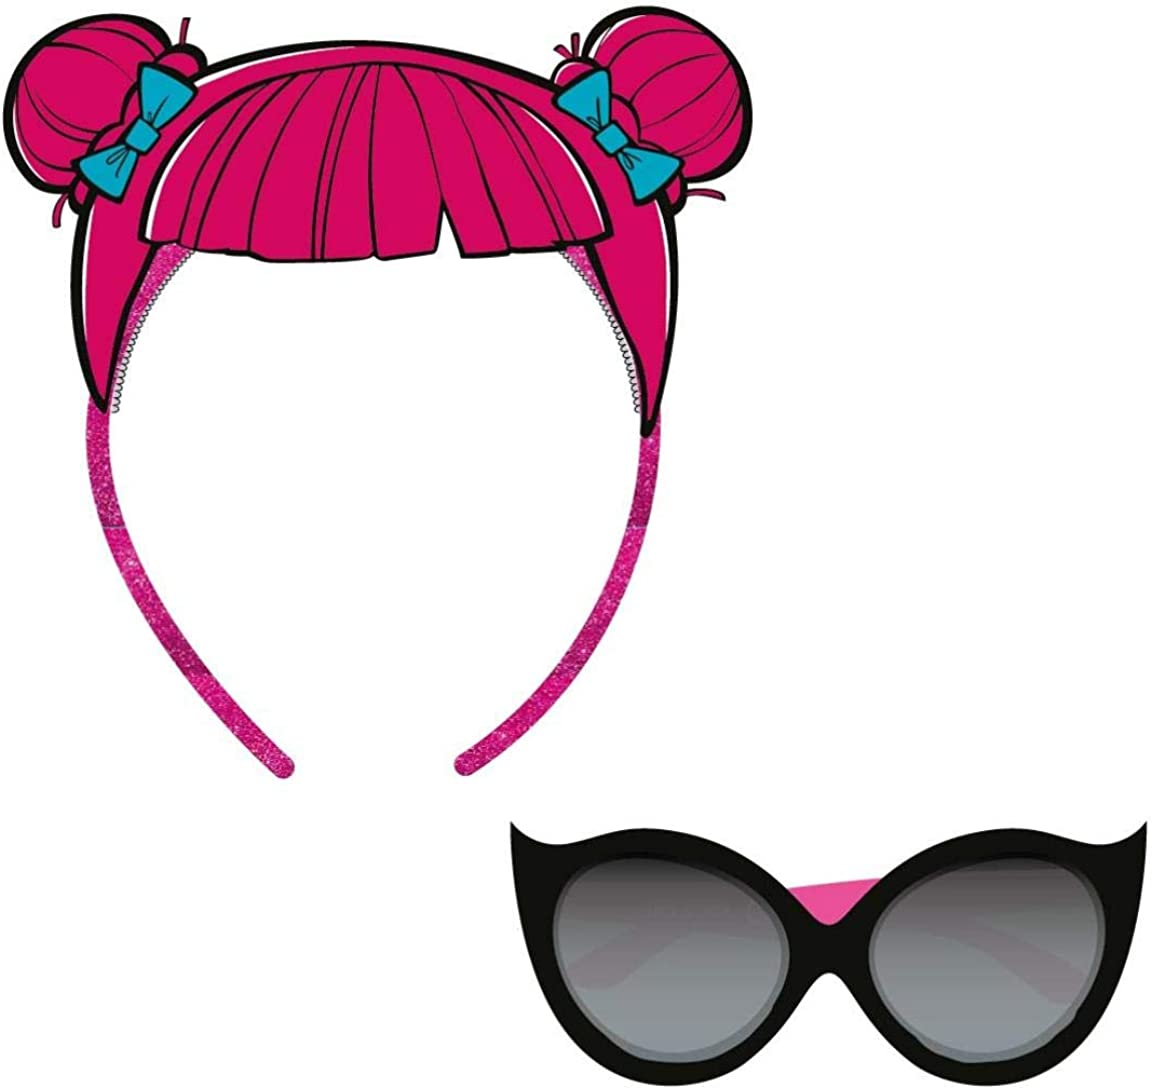 Artesania Cerda Girls/' Gafas De Sol Blister LOL Sunglasses Black 40.0 Negro